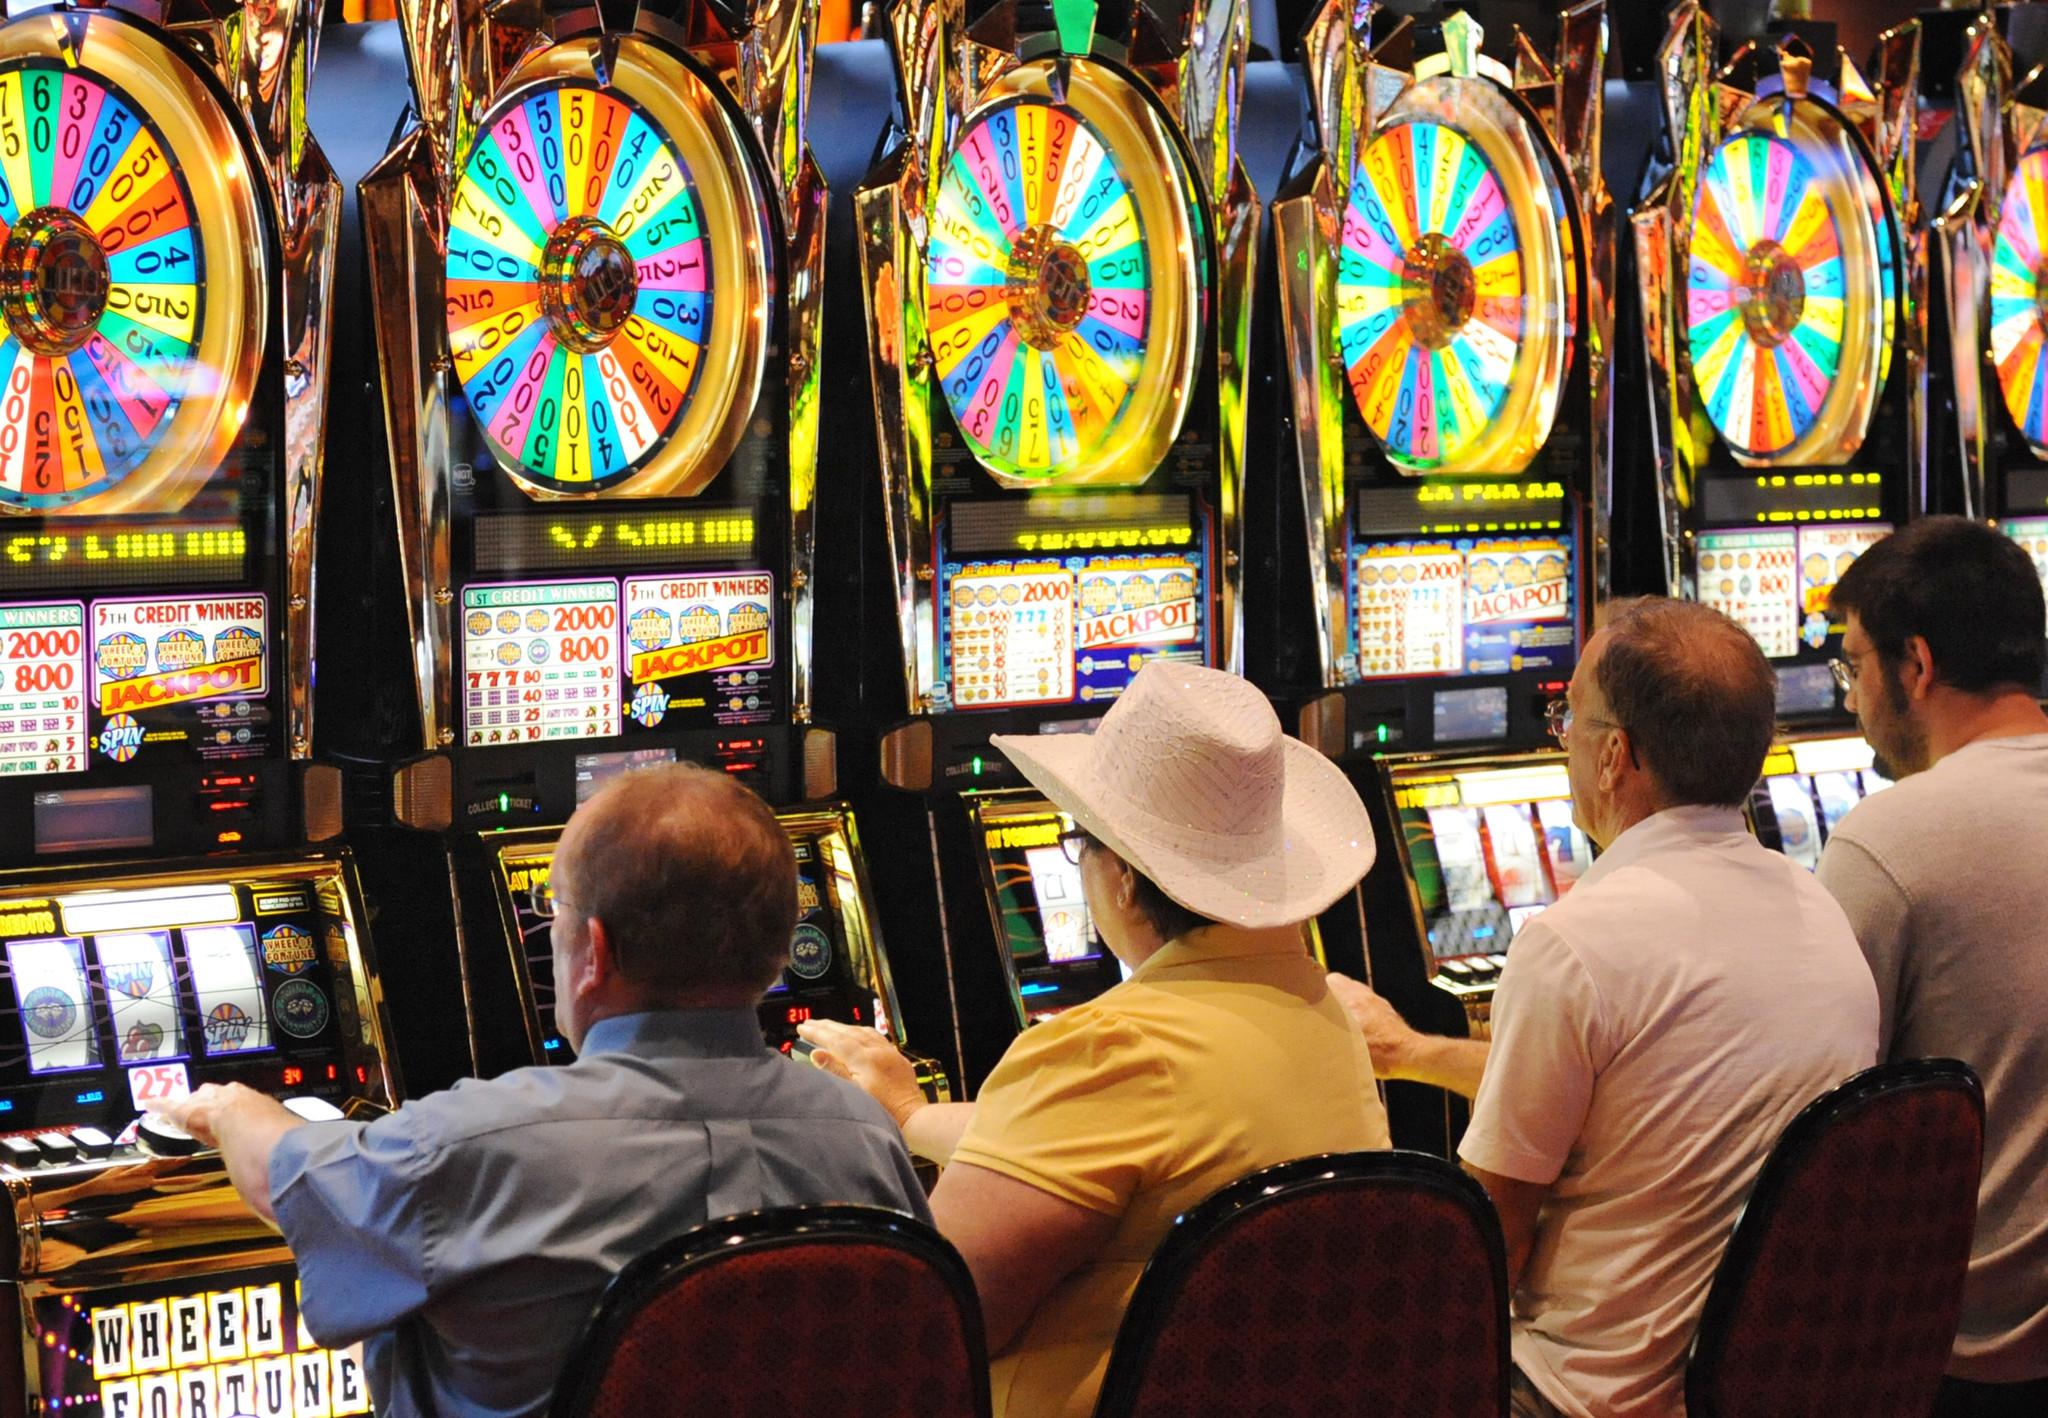 Does casino affect community harrods casino mo